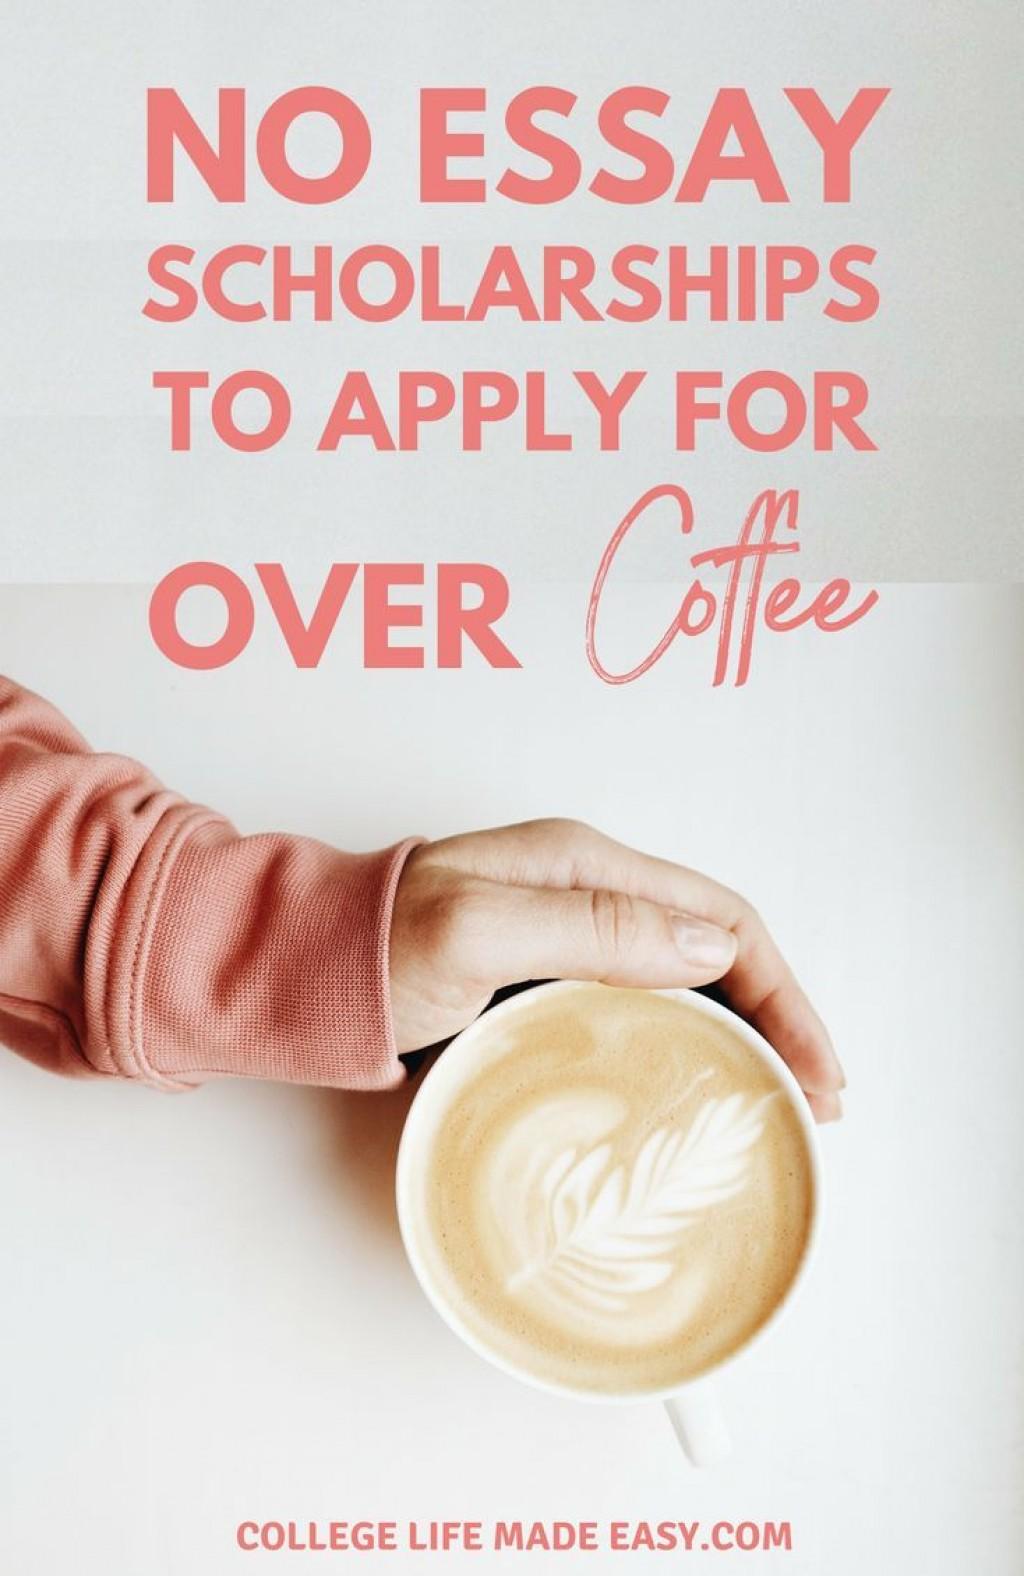 012 Easy No Essay Scholarships Striking 2015 2019 Large